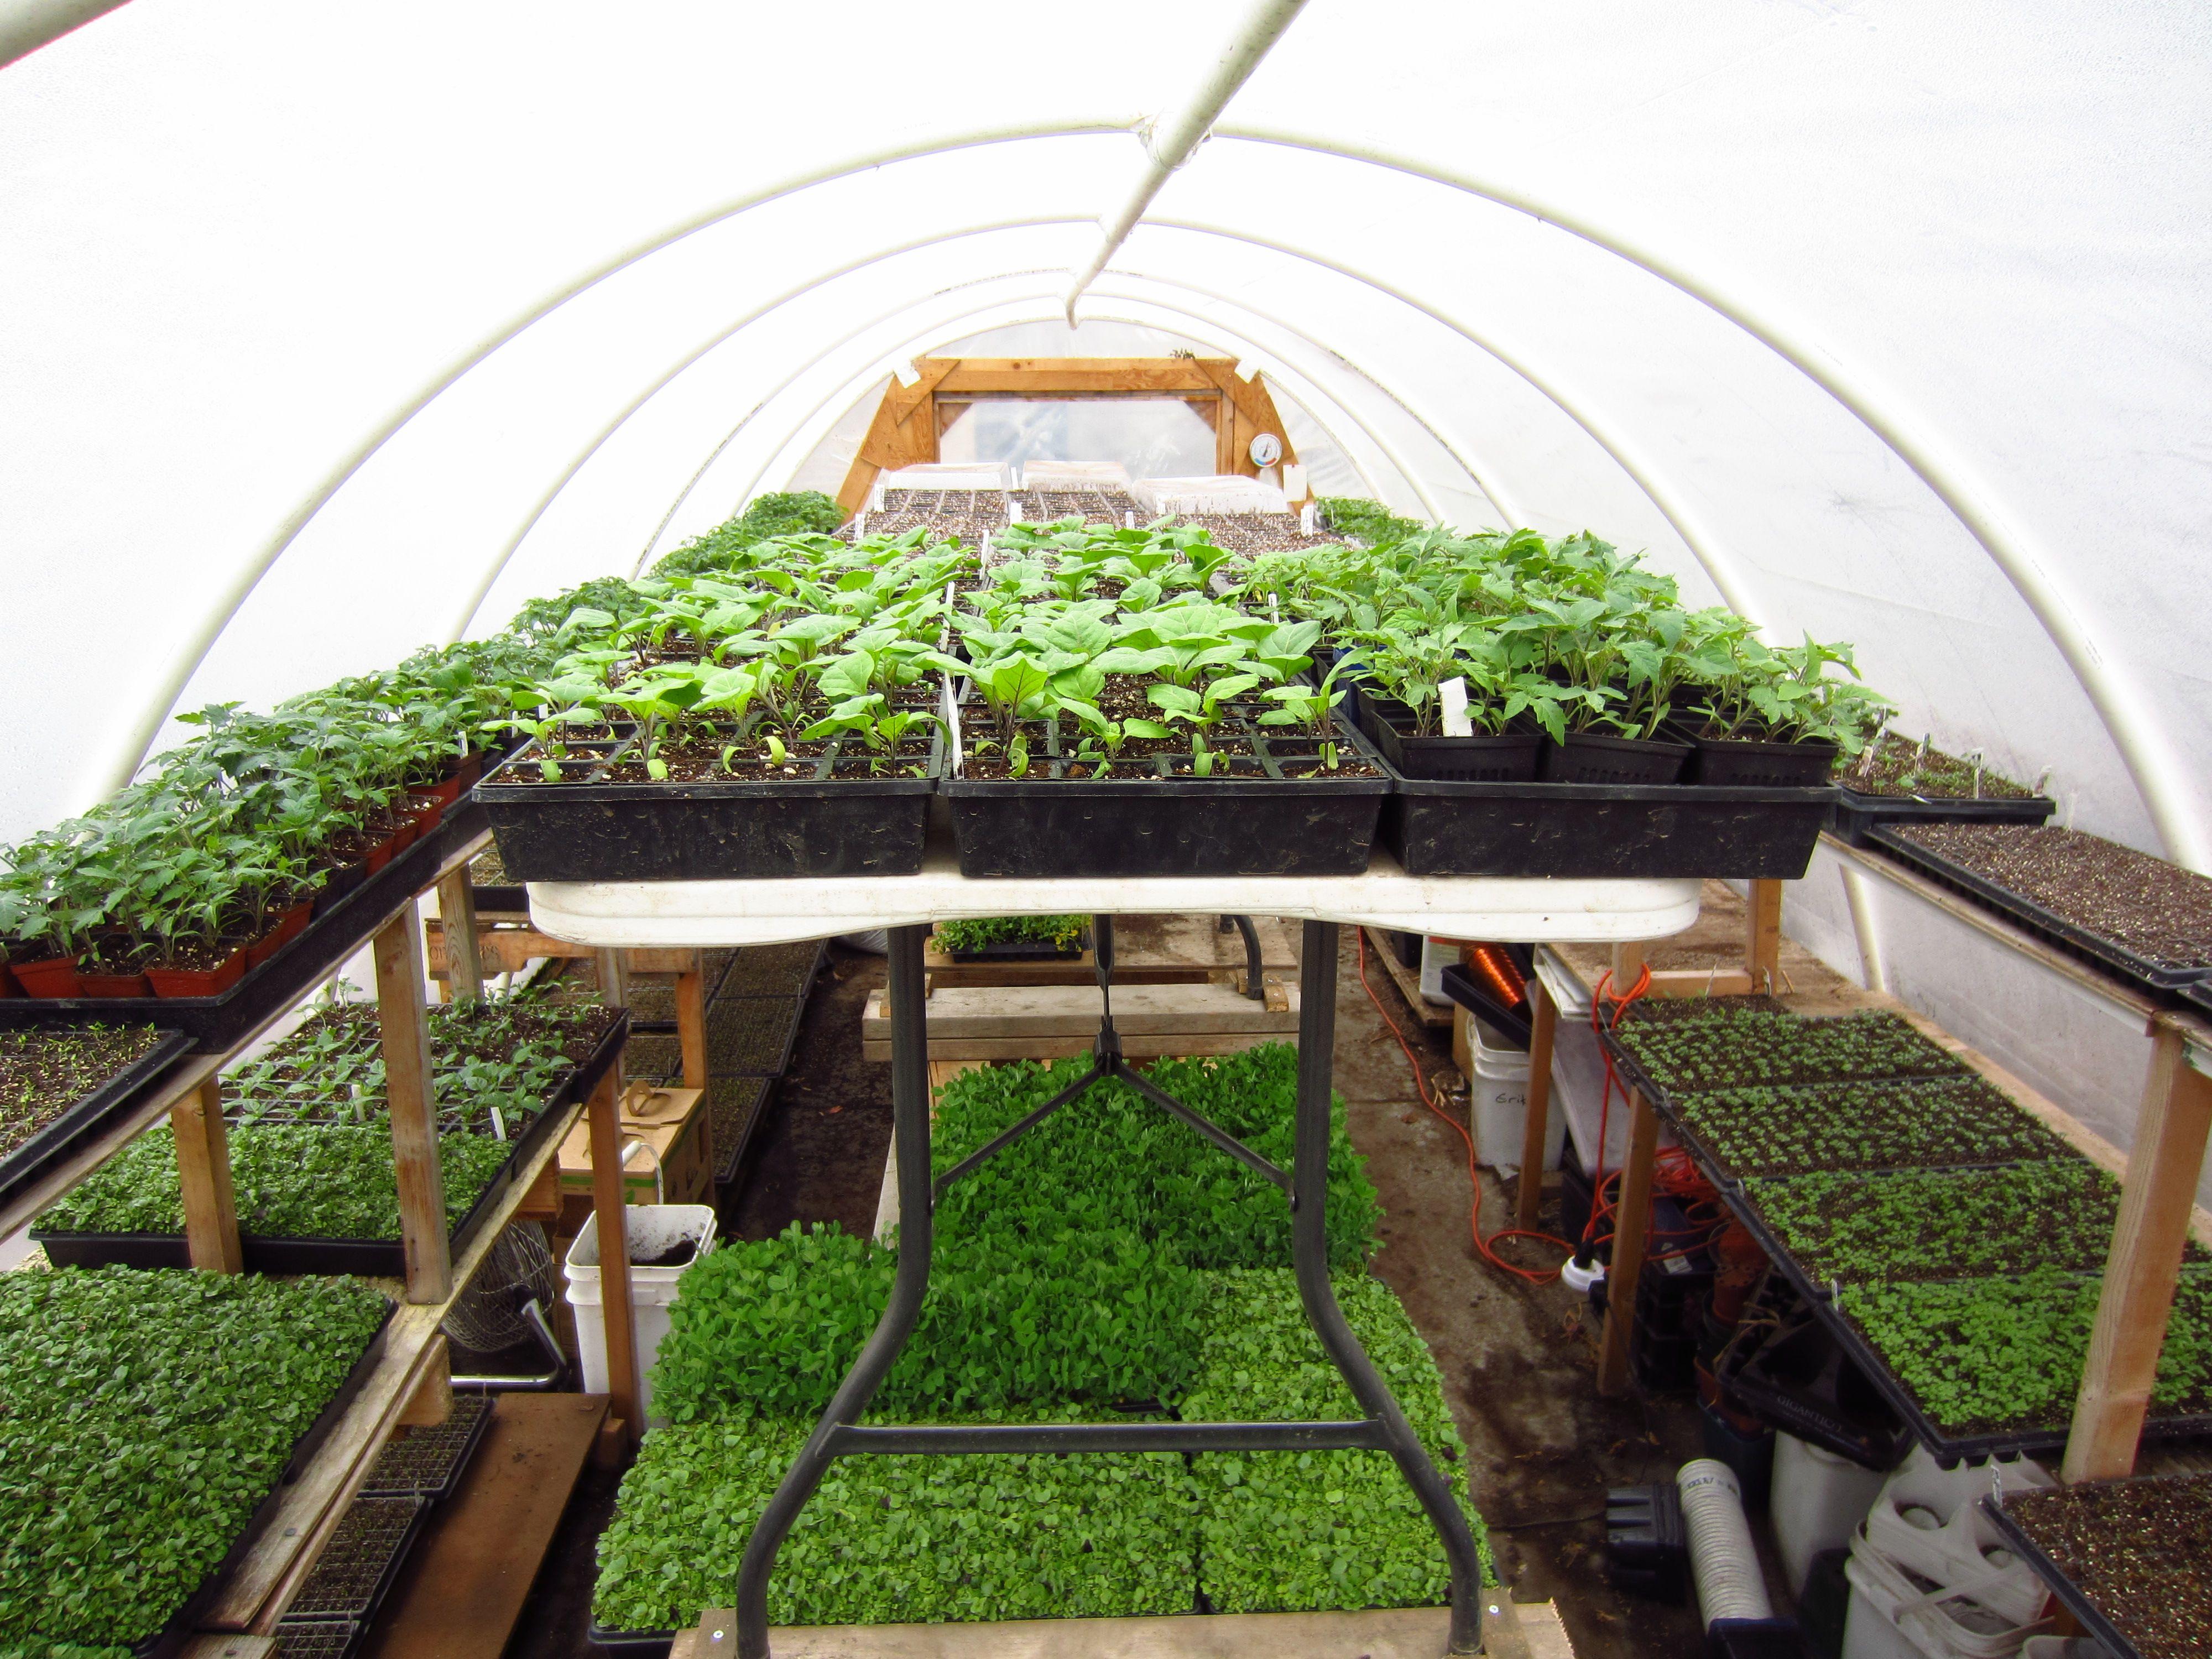 80k Year Farming On 1 3 Acre Square Foot Gardening Meets Commercial Farming Urban Farmer Commercial Farming Sustainable Garden Design Urban backyard farming for profit